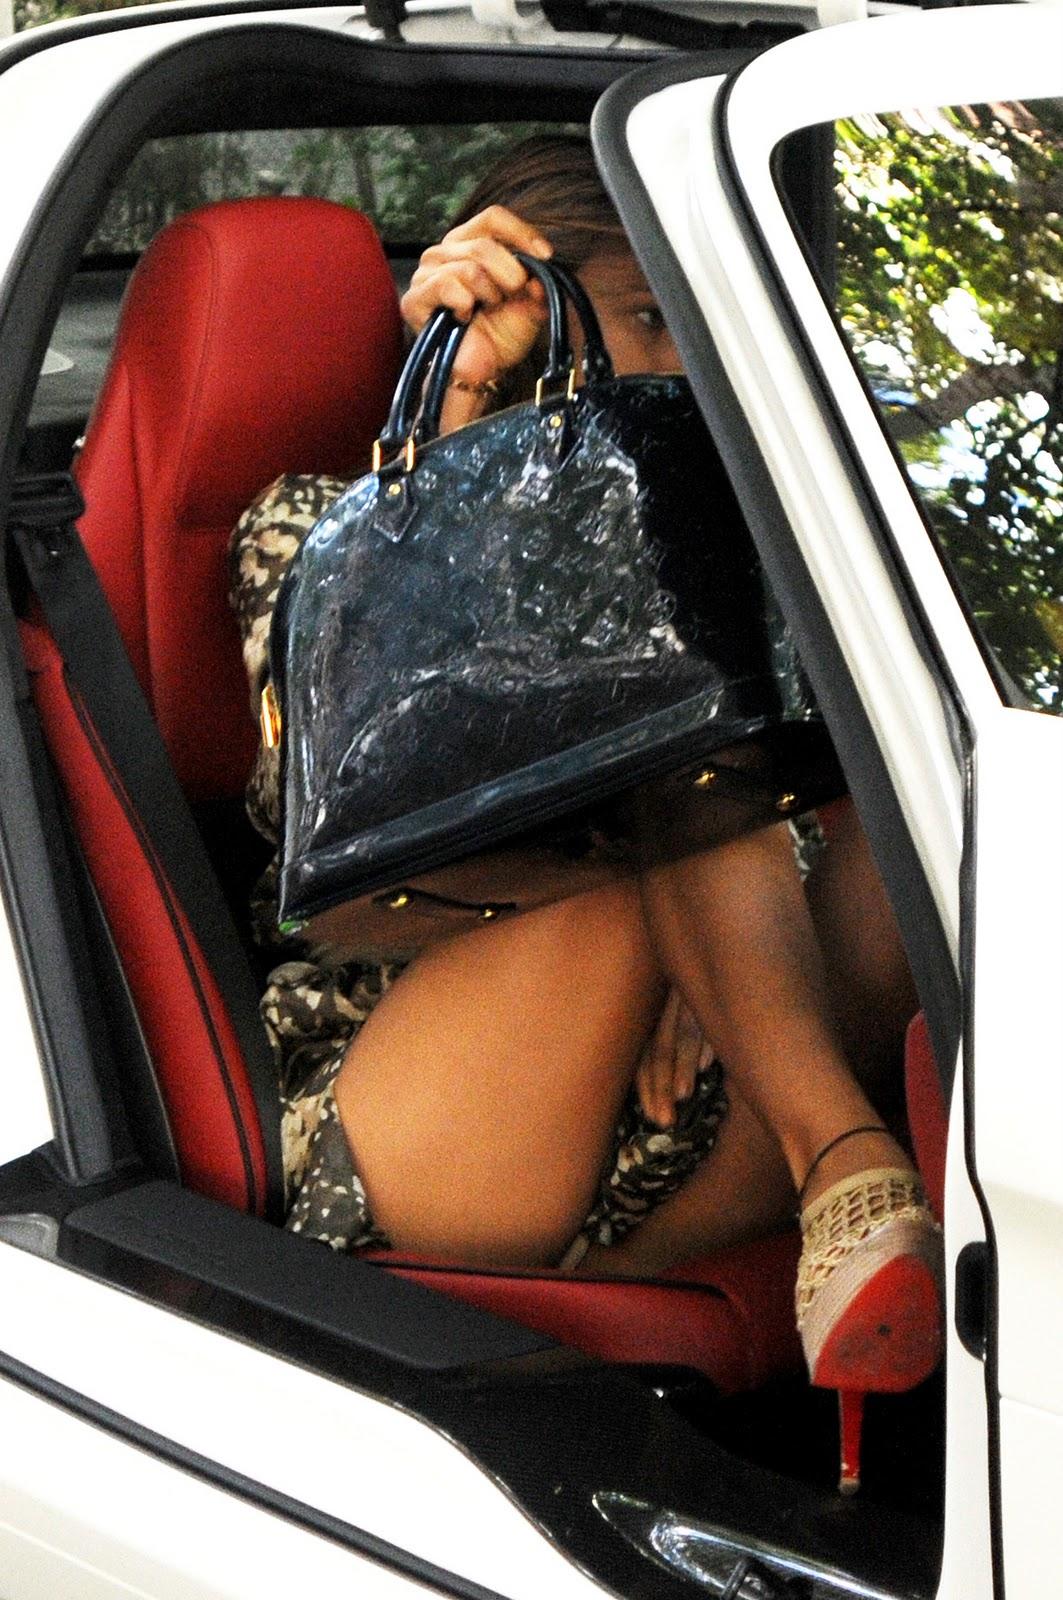 http://3.bp.blogspot.com/-s58Rv308GpY/TZy406Rz1fI/AAAAAAAAQE4/jvORjJAXm18/s1600/6317_irina-shayk-car-upskirt-01.jpg